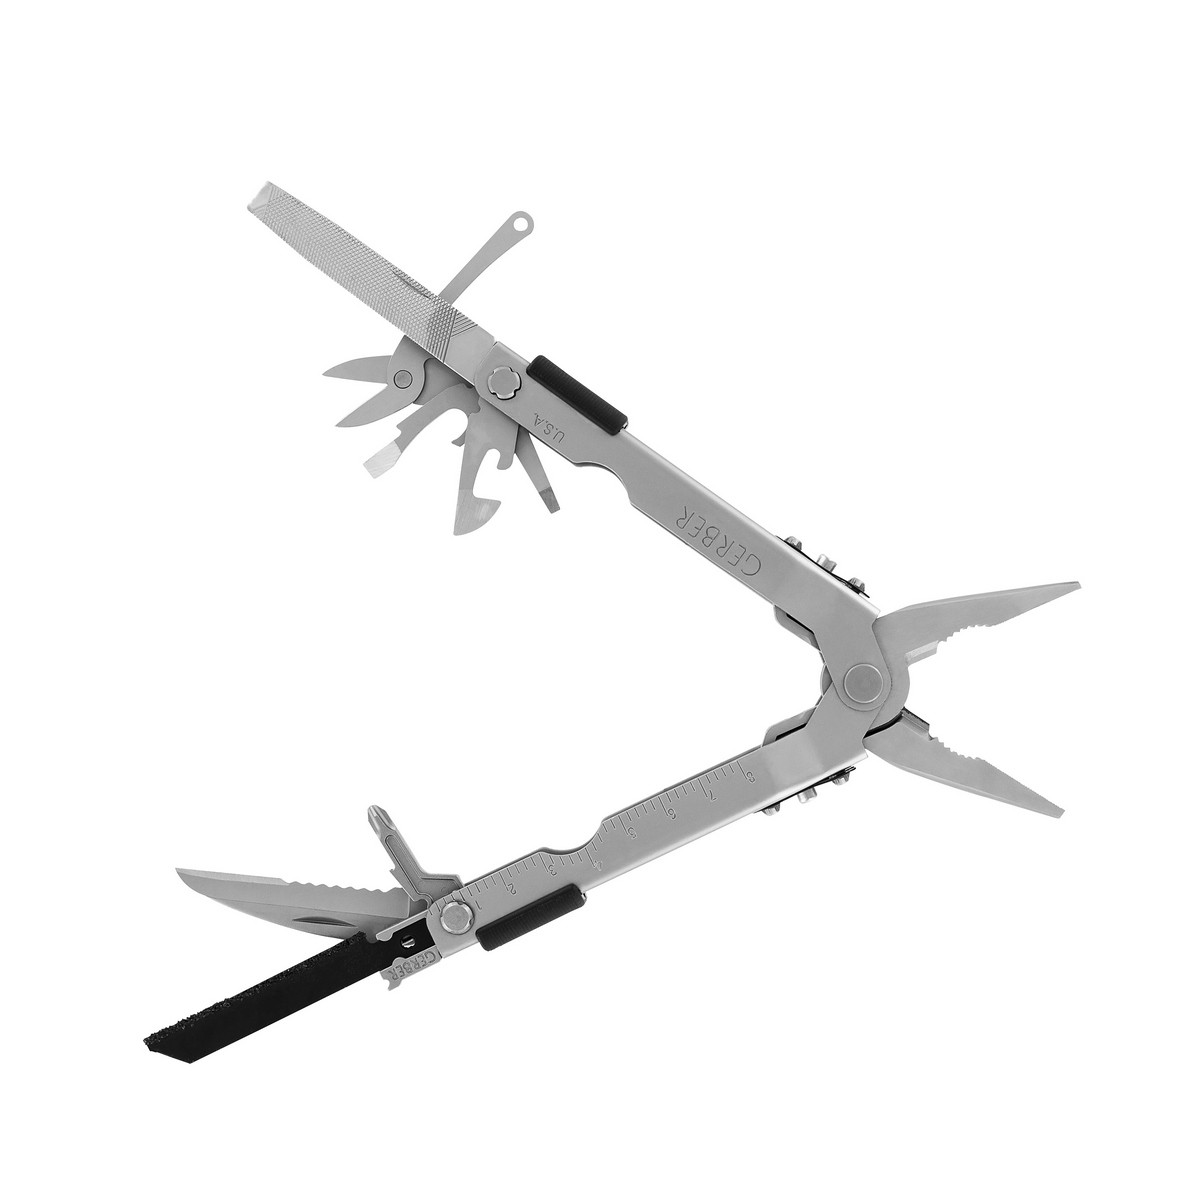 Мультитул Gerber Multi-Plier 600 Pro Scout Needlenose коробка